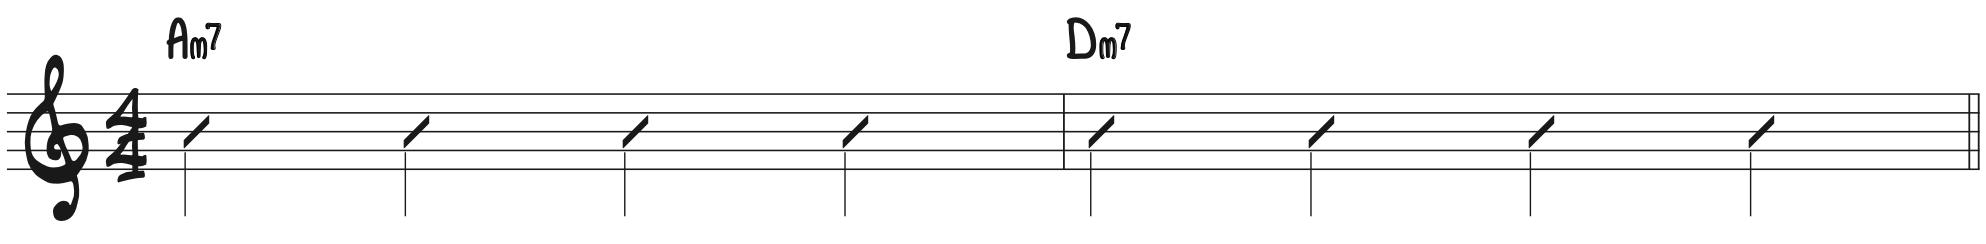 Quarter note melody in rhythmic notation